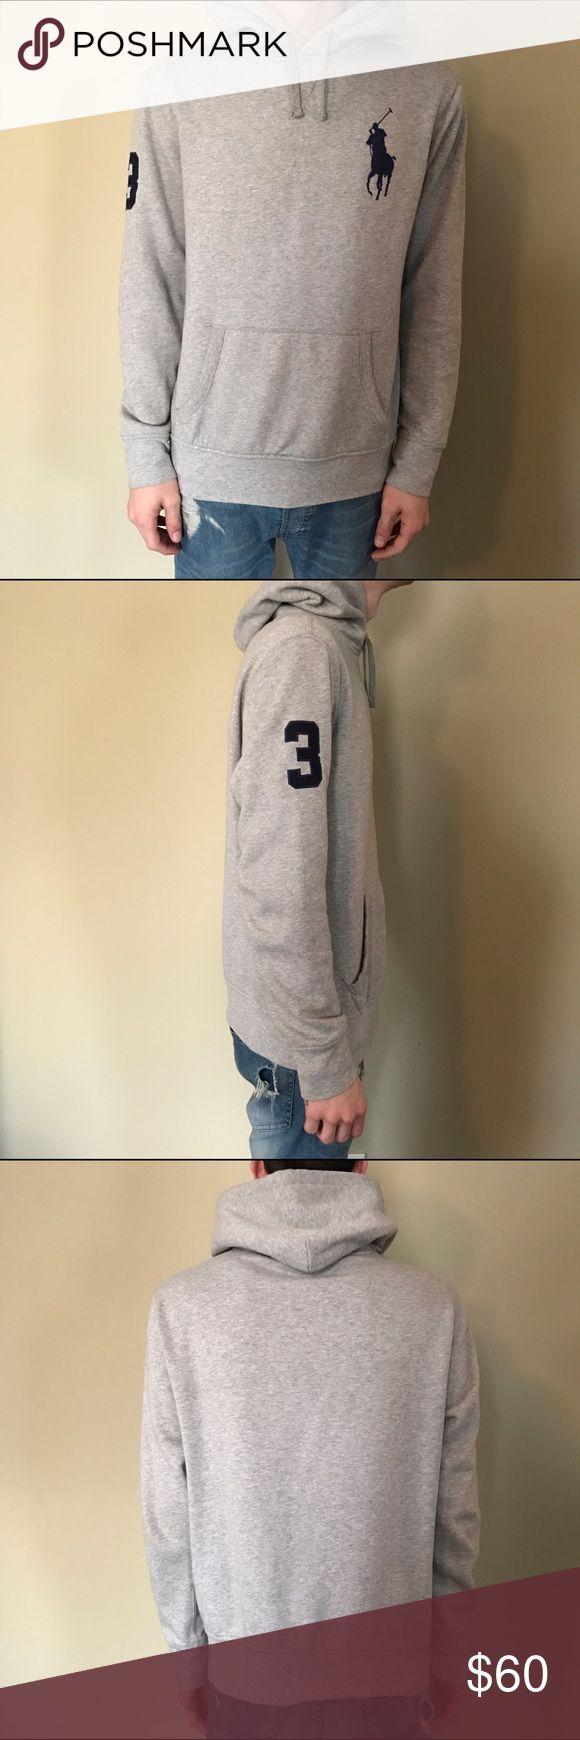 Polo by Ralph Lauren Hoody Gray. Lightly worn. Snug fit. Polo by Ralph Lauren Shirts Sweatshirts & Hoodies